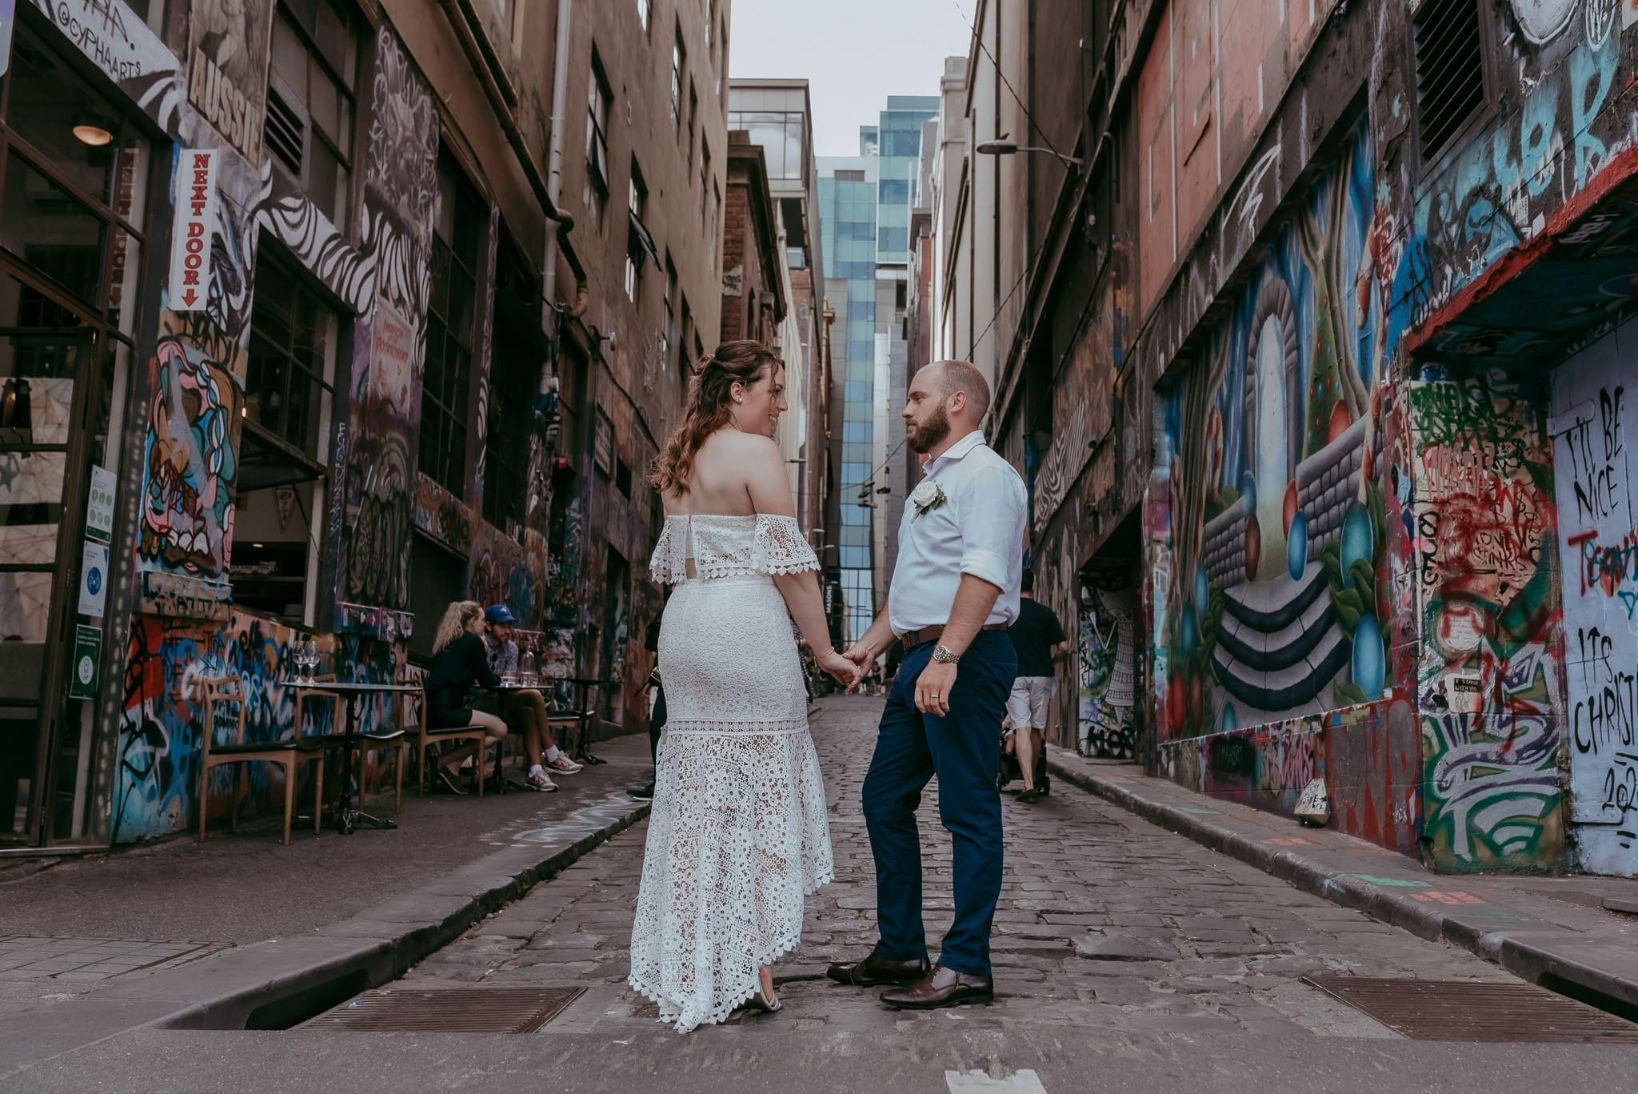 Wedding Photos Around The City